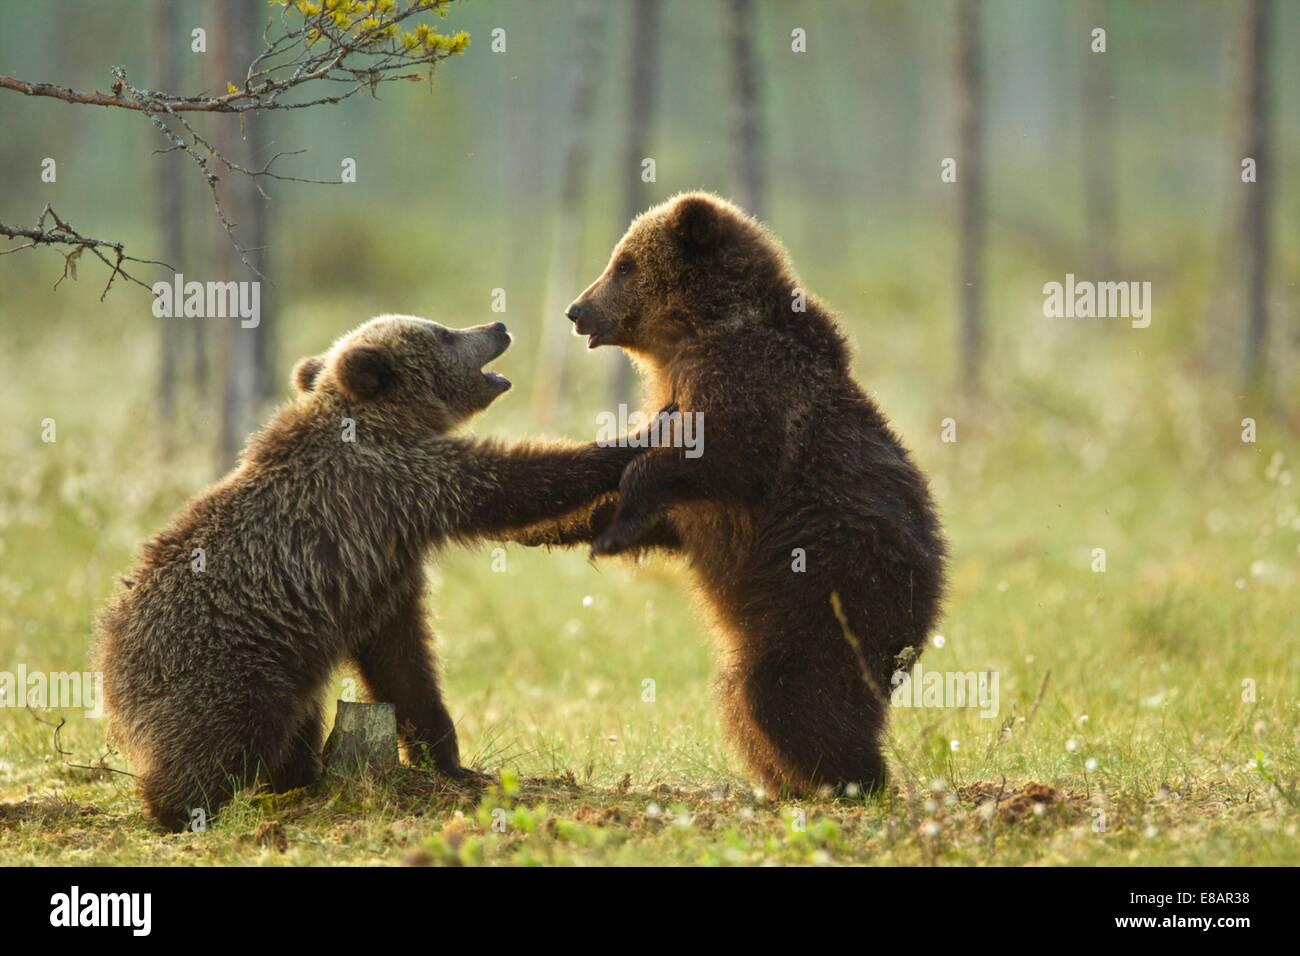 Dos crías de oso pardo (Ursus arctos combates play) en bosques de taiga, Finlandia Imagen De Stock